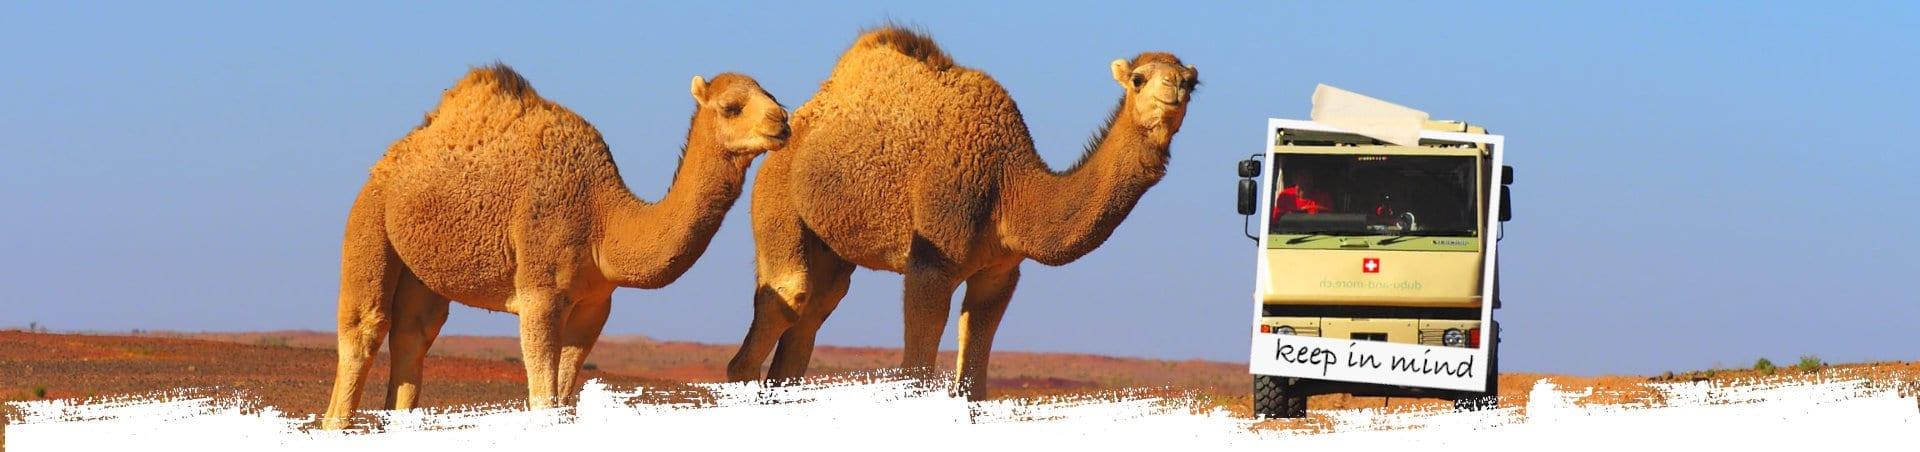 Marokko Dromedar